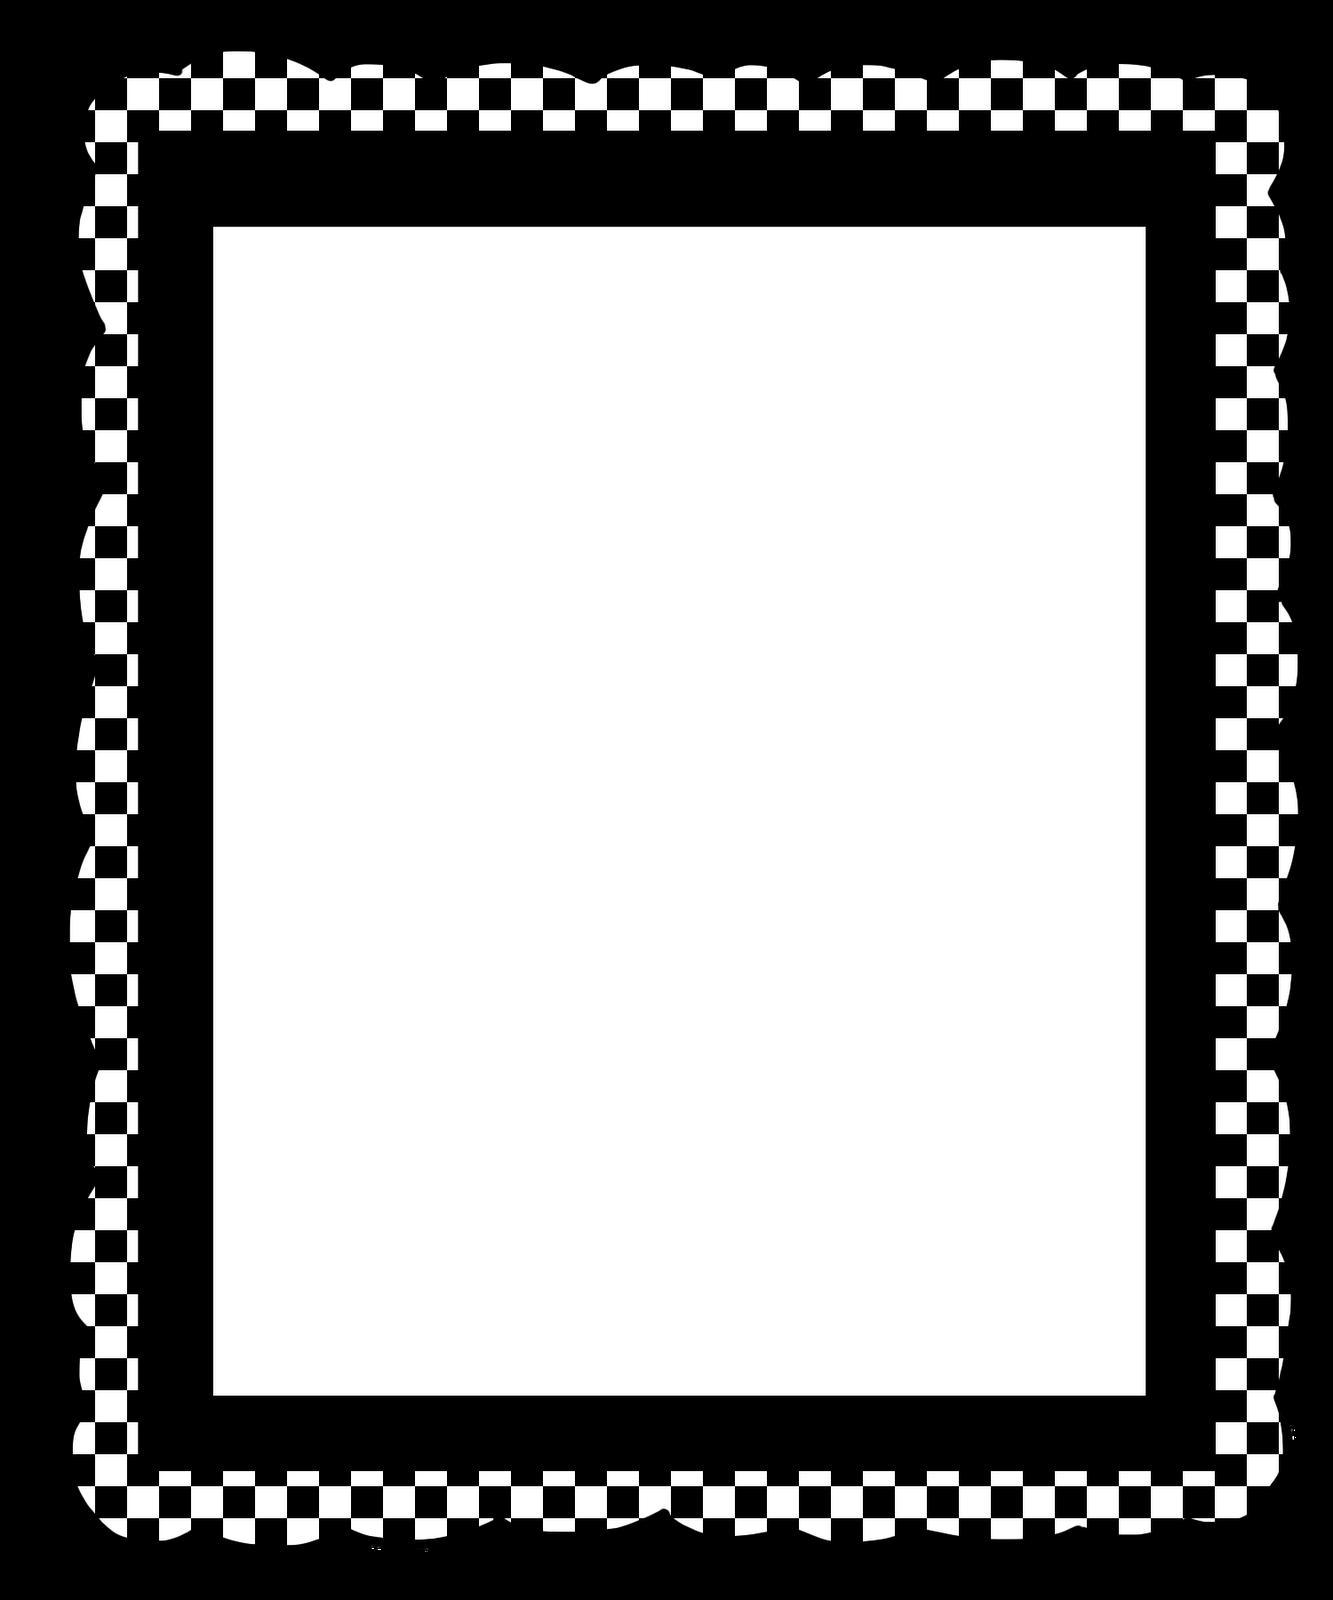 Clipart smile border. Kindergarten panda free images